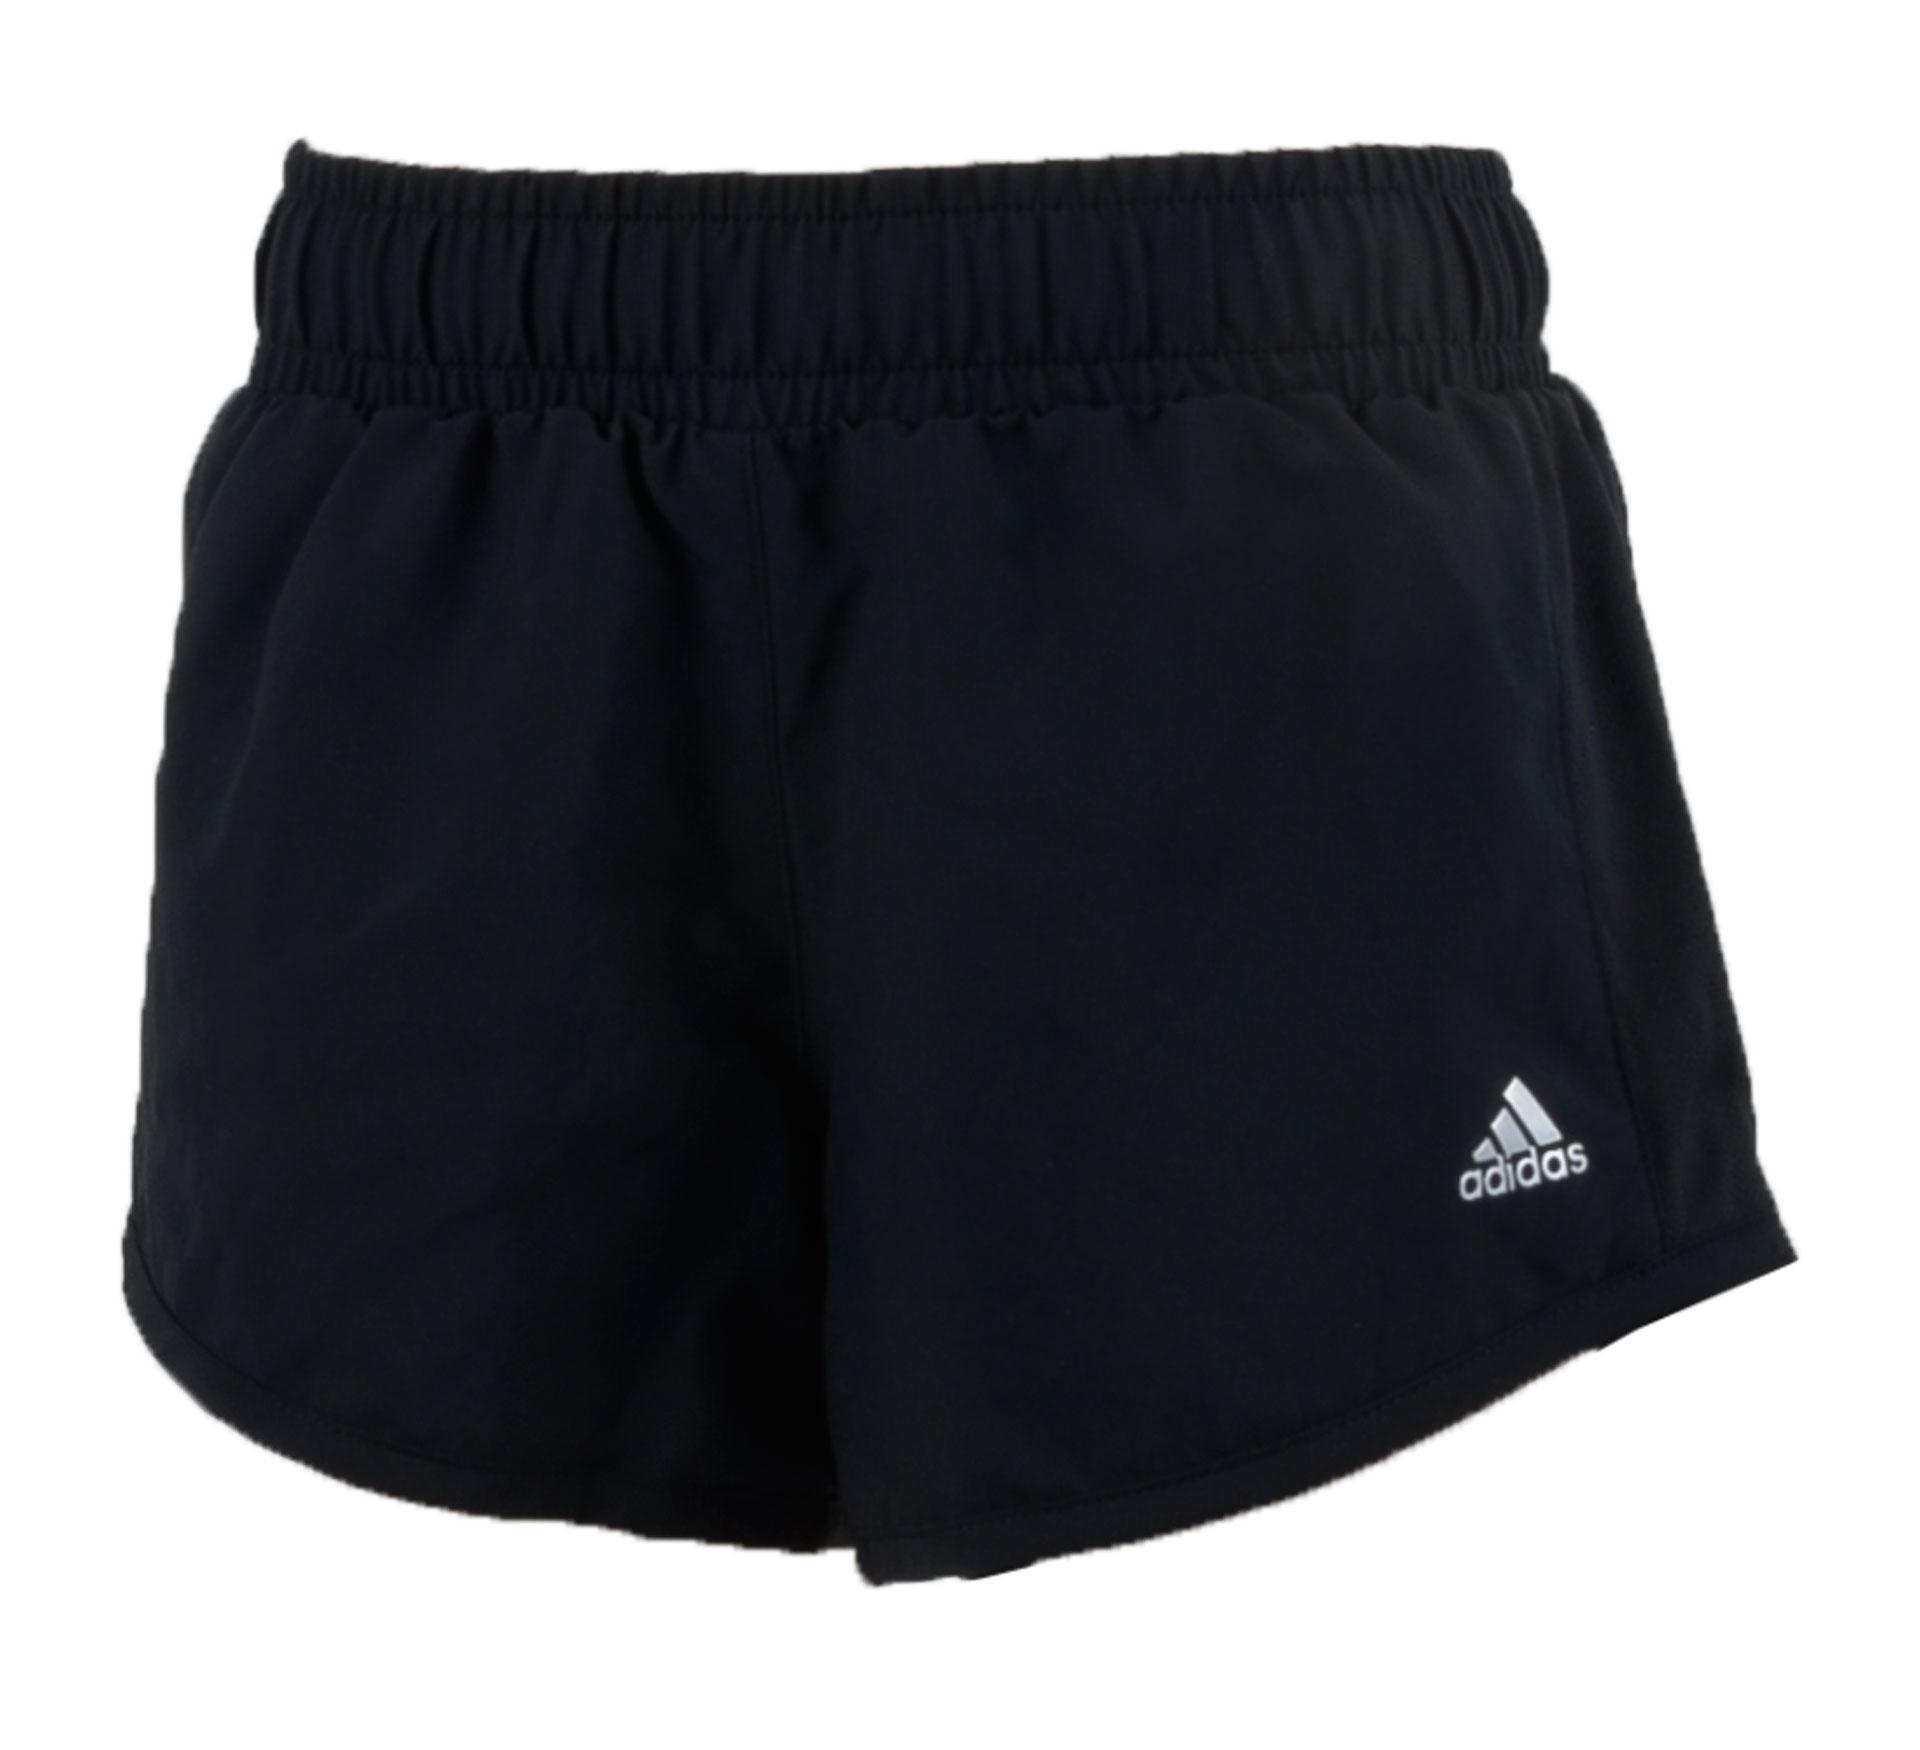 Adidas Prime Short Junior zwart